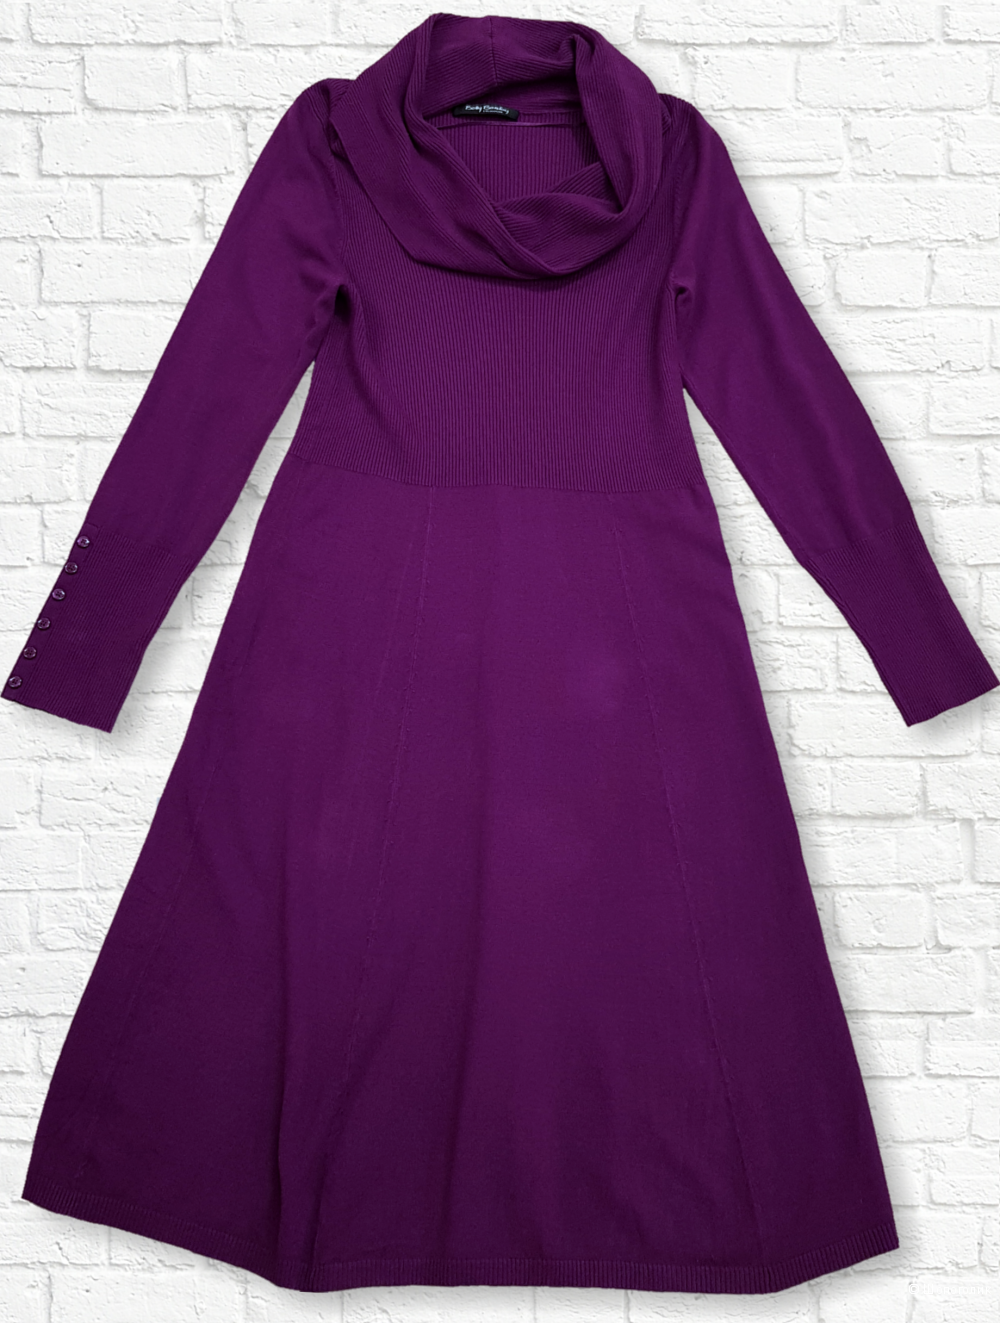 Платье. Betty Barclay. 46/48